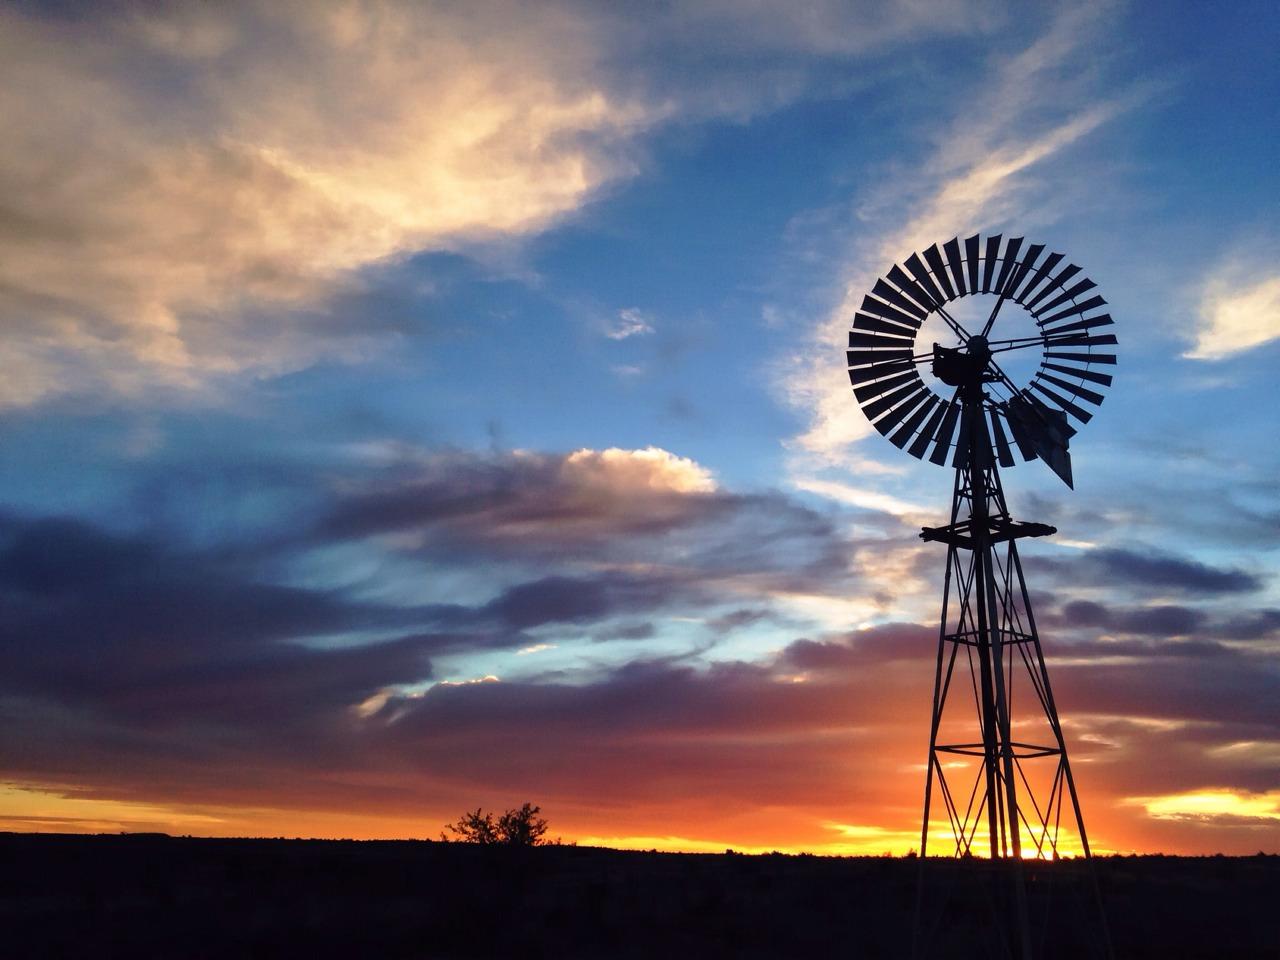 Nothing like a Karoo sunset || #karoo #sunset #southafrica #iPhoneOnly